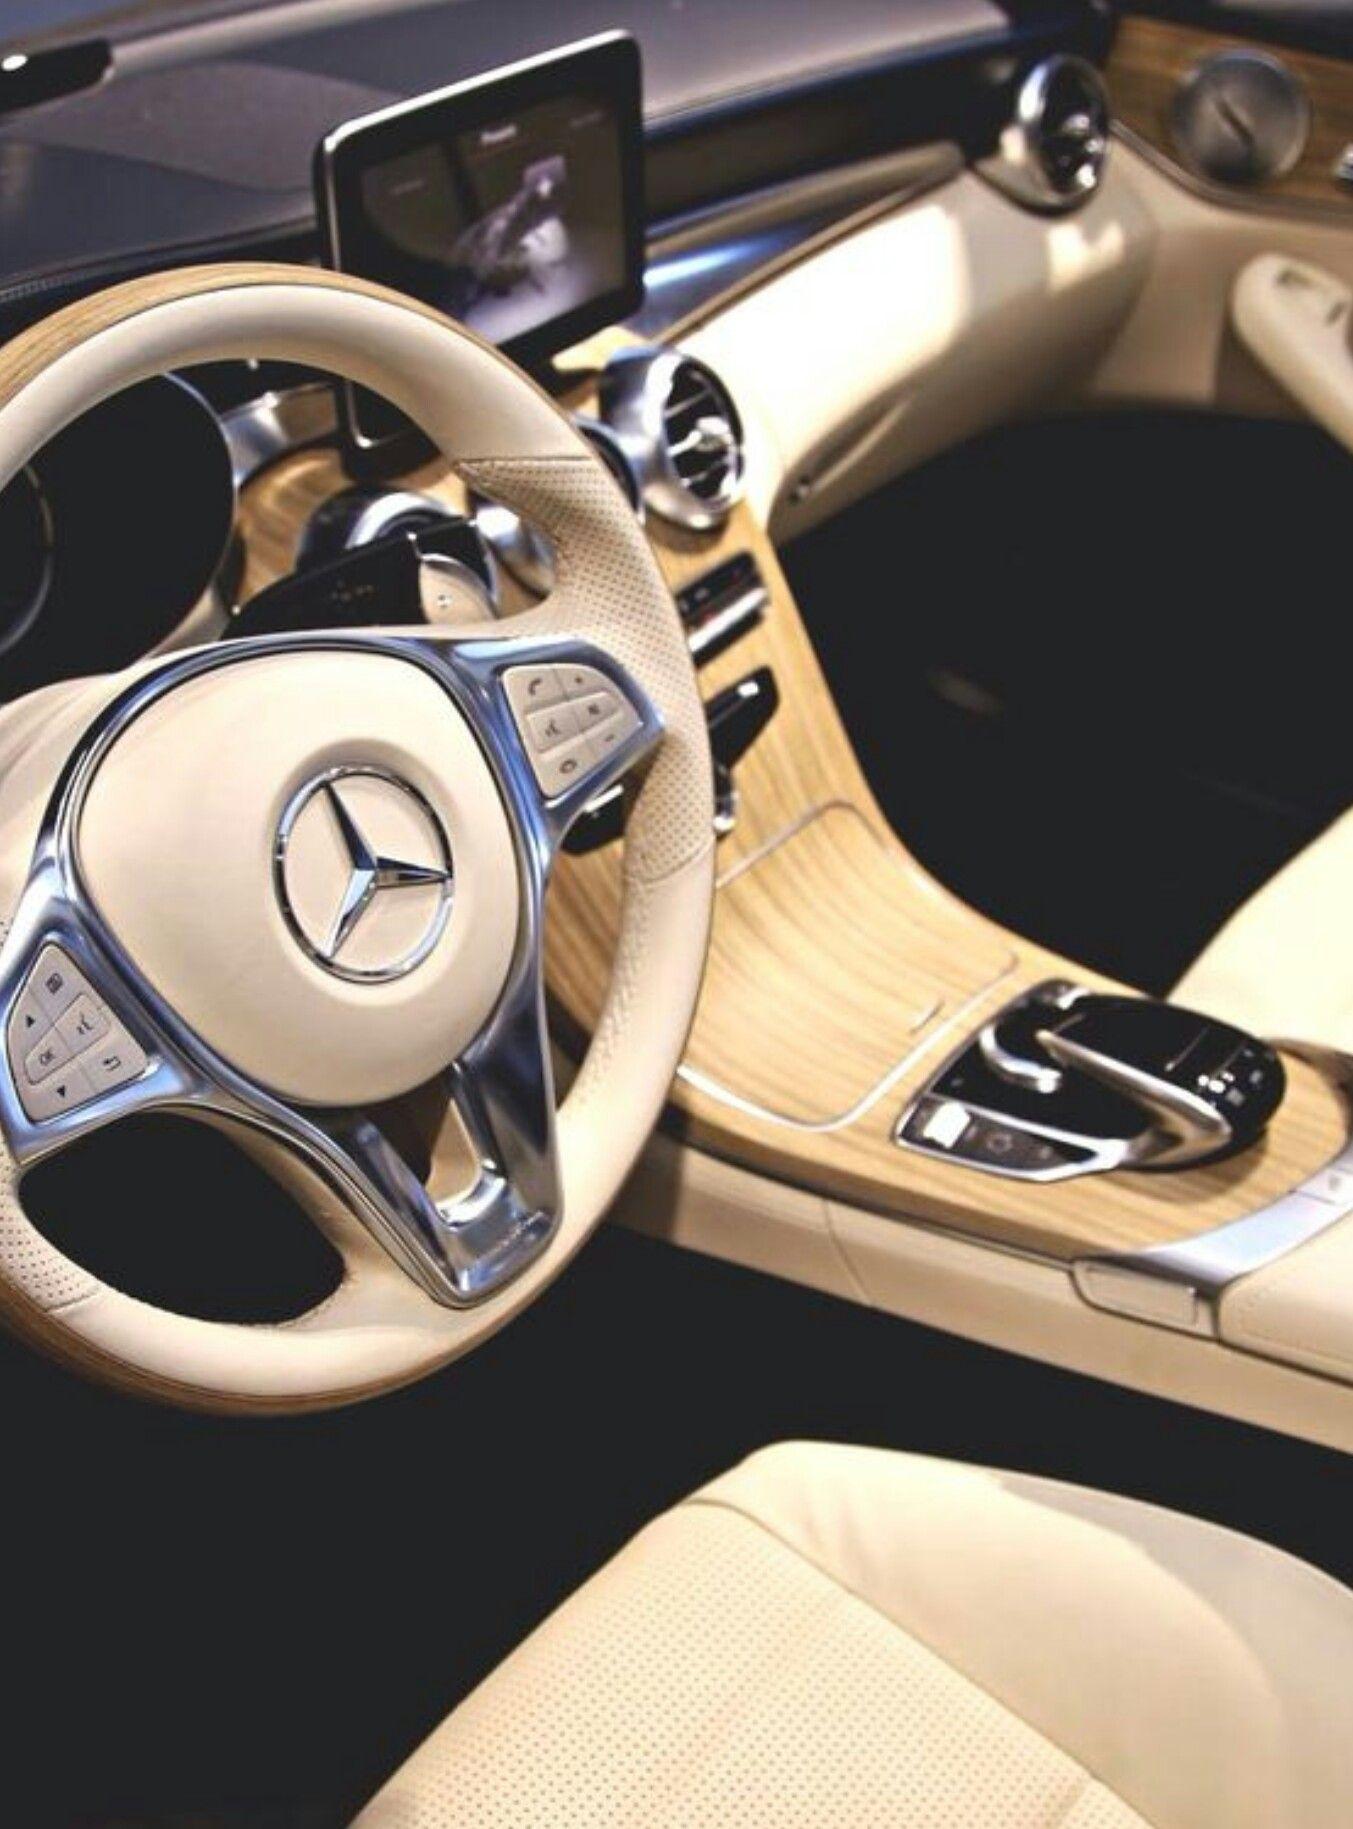 Pin By Martin Vanek On Car Interior Wood Pinterest Luxury Cars